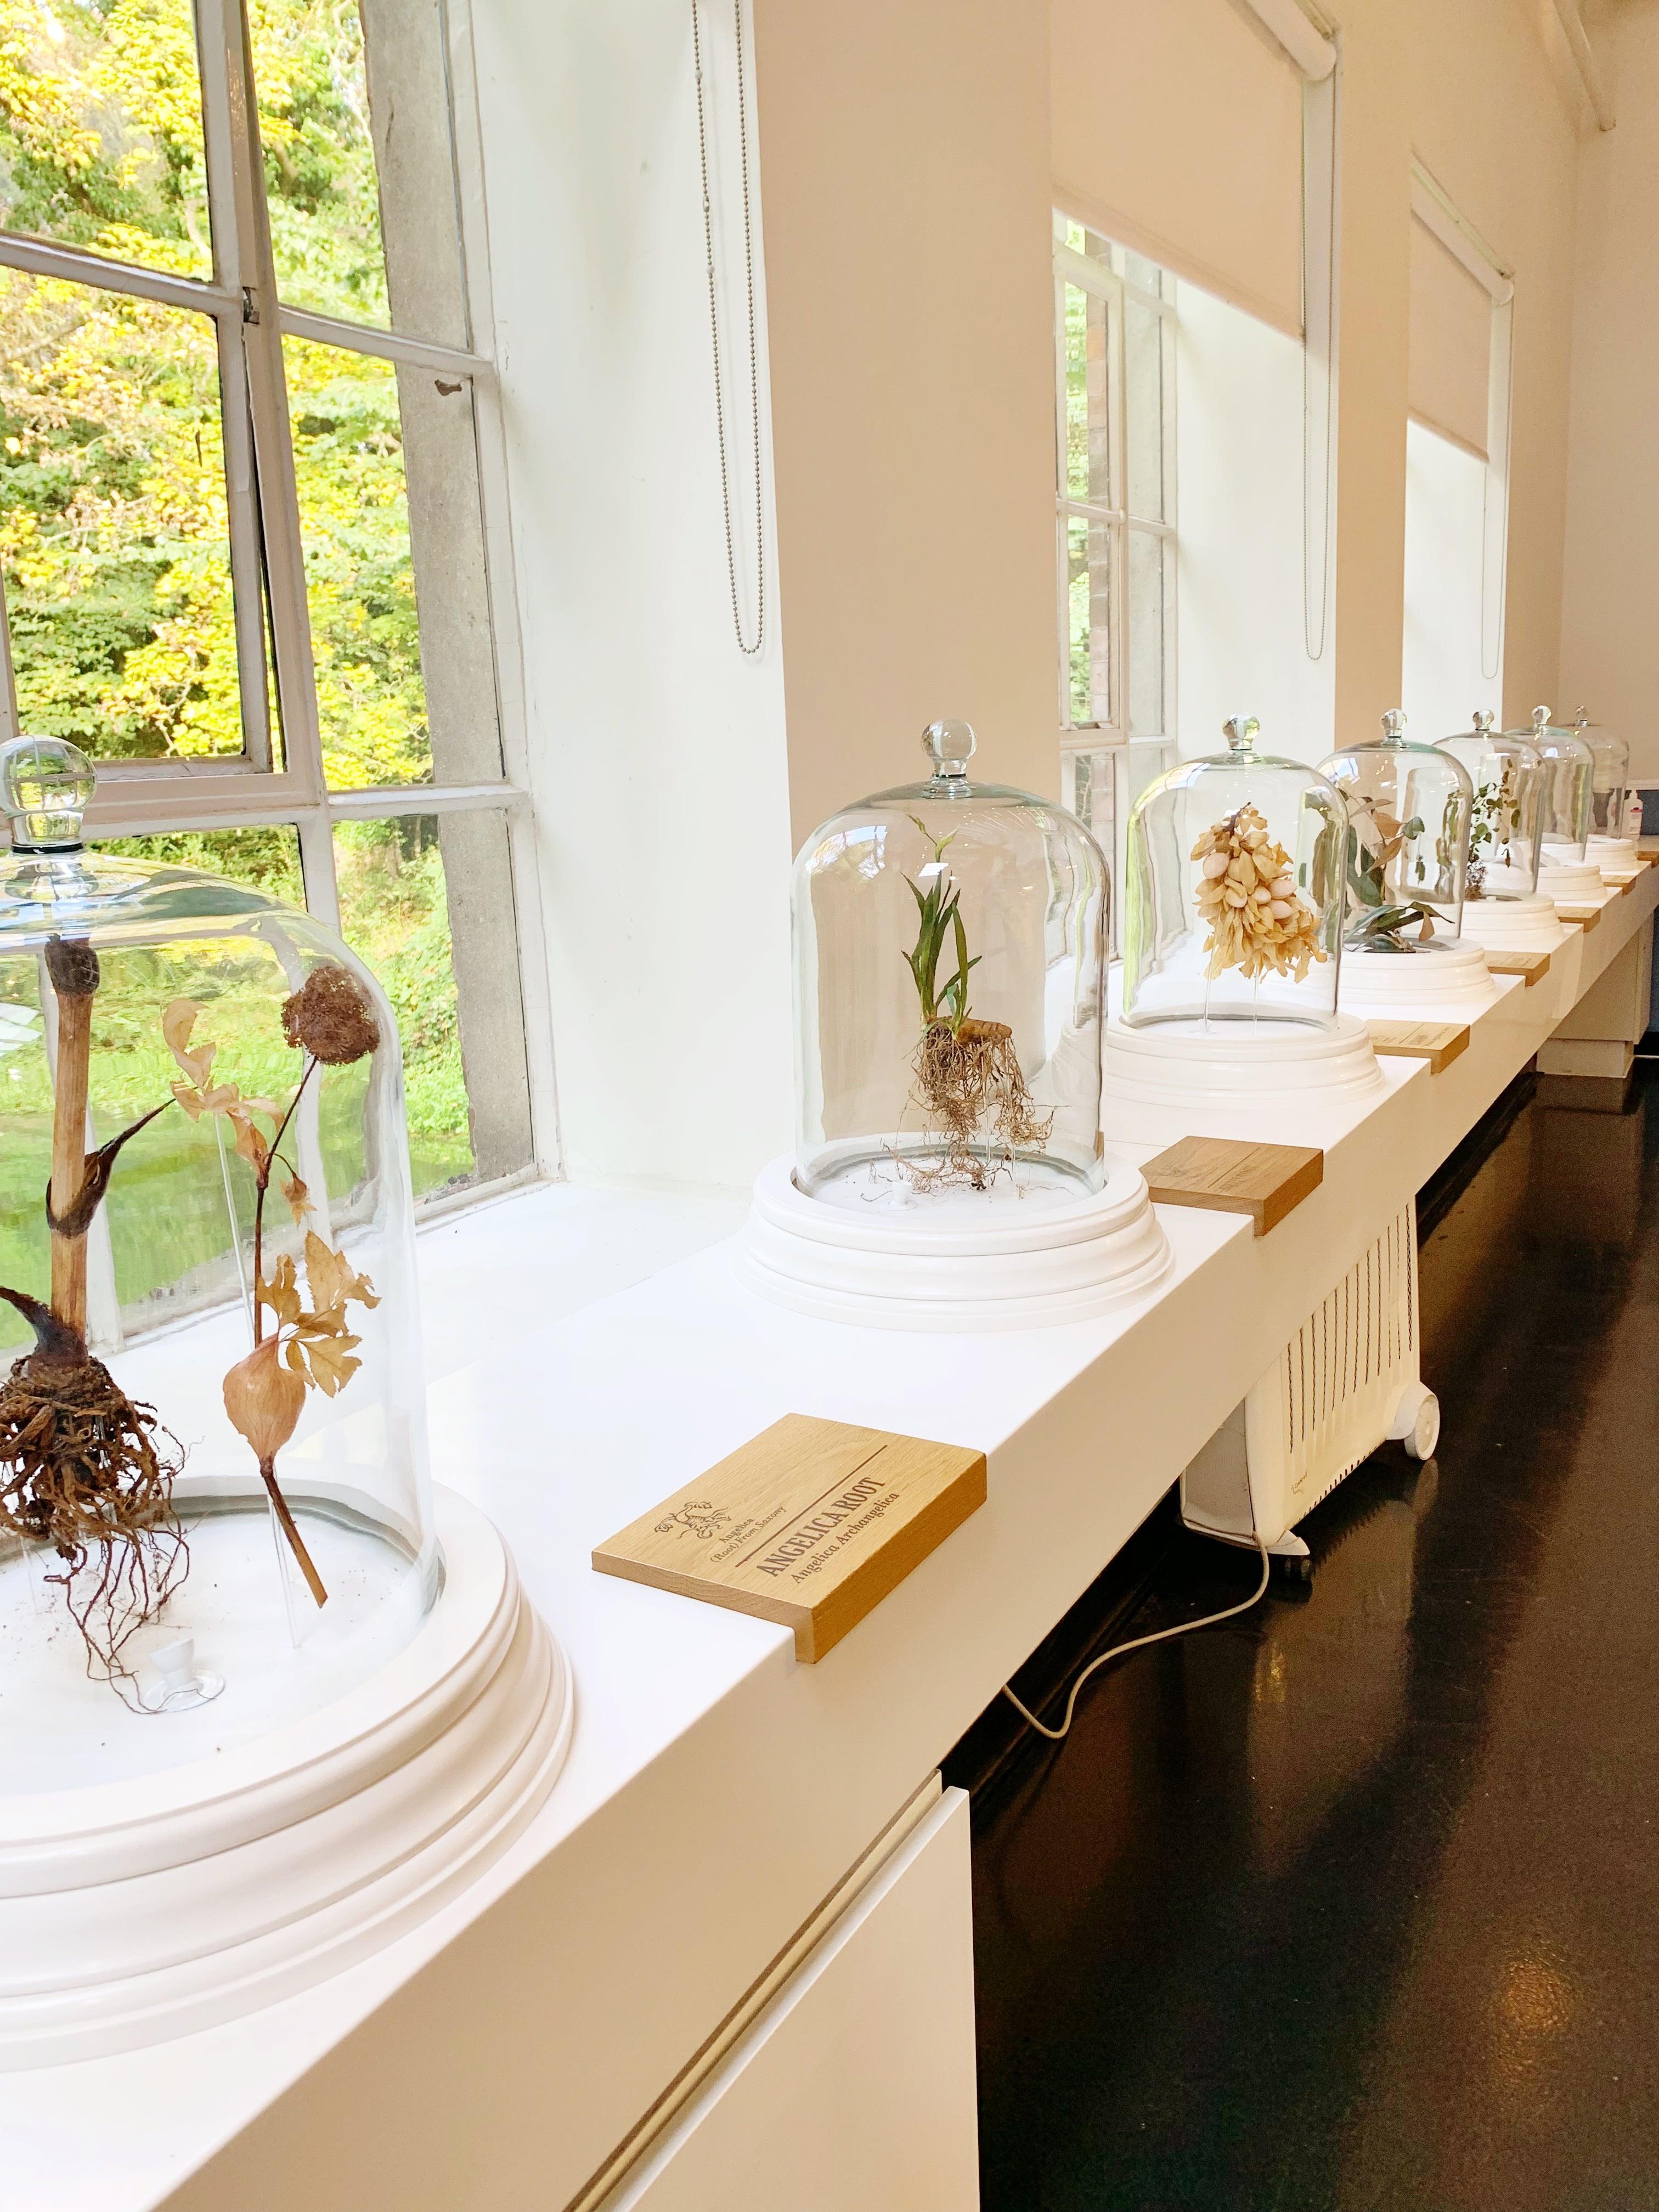 Botanical room at Bombay Sapphire